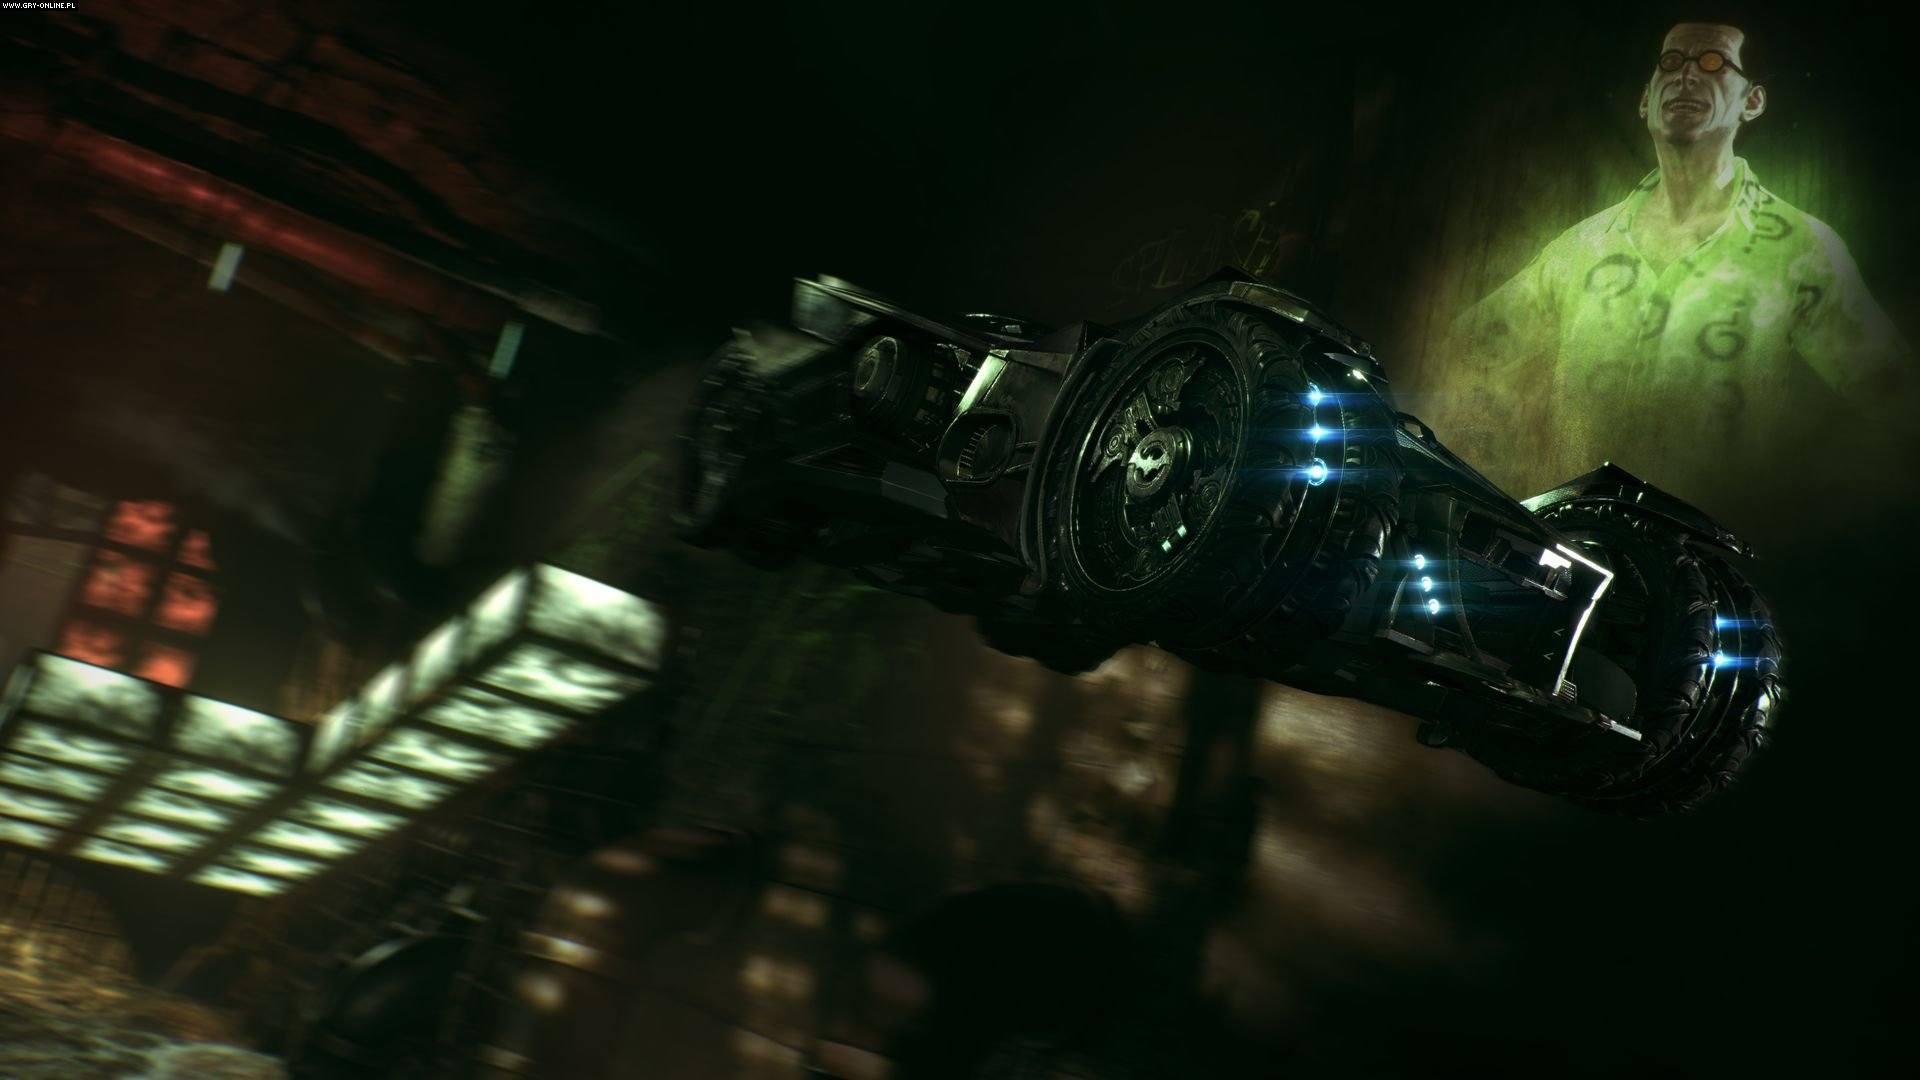 Batman Arkham Knight image #7